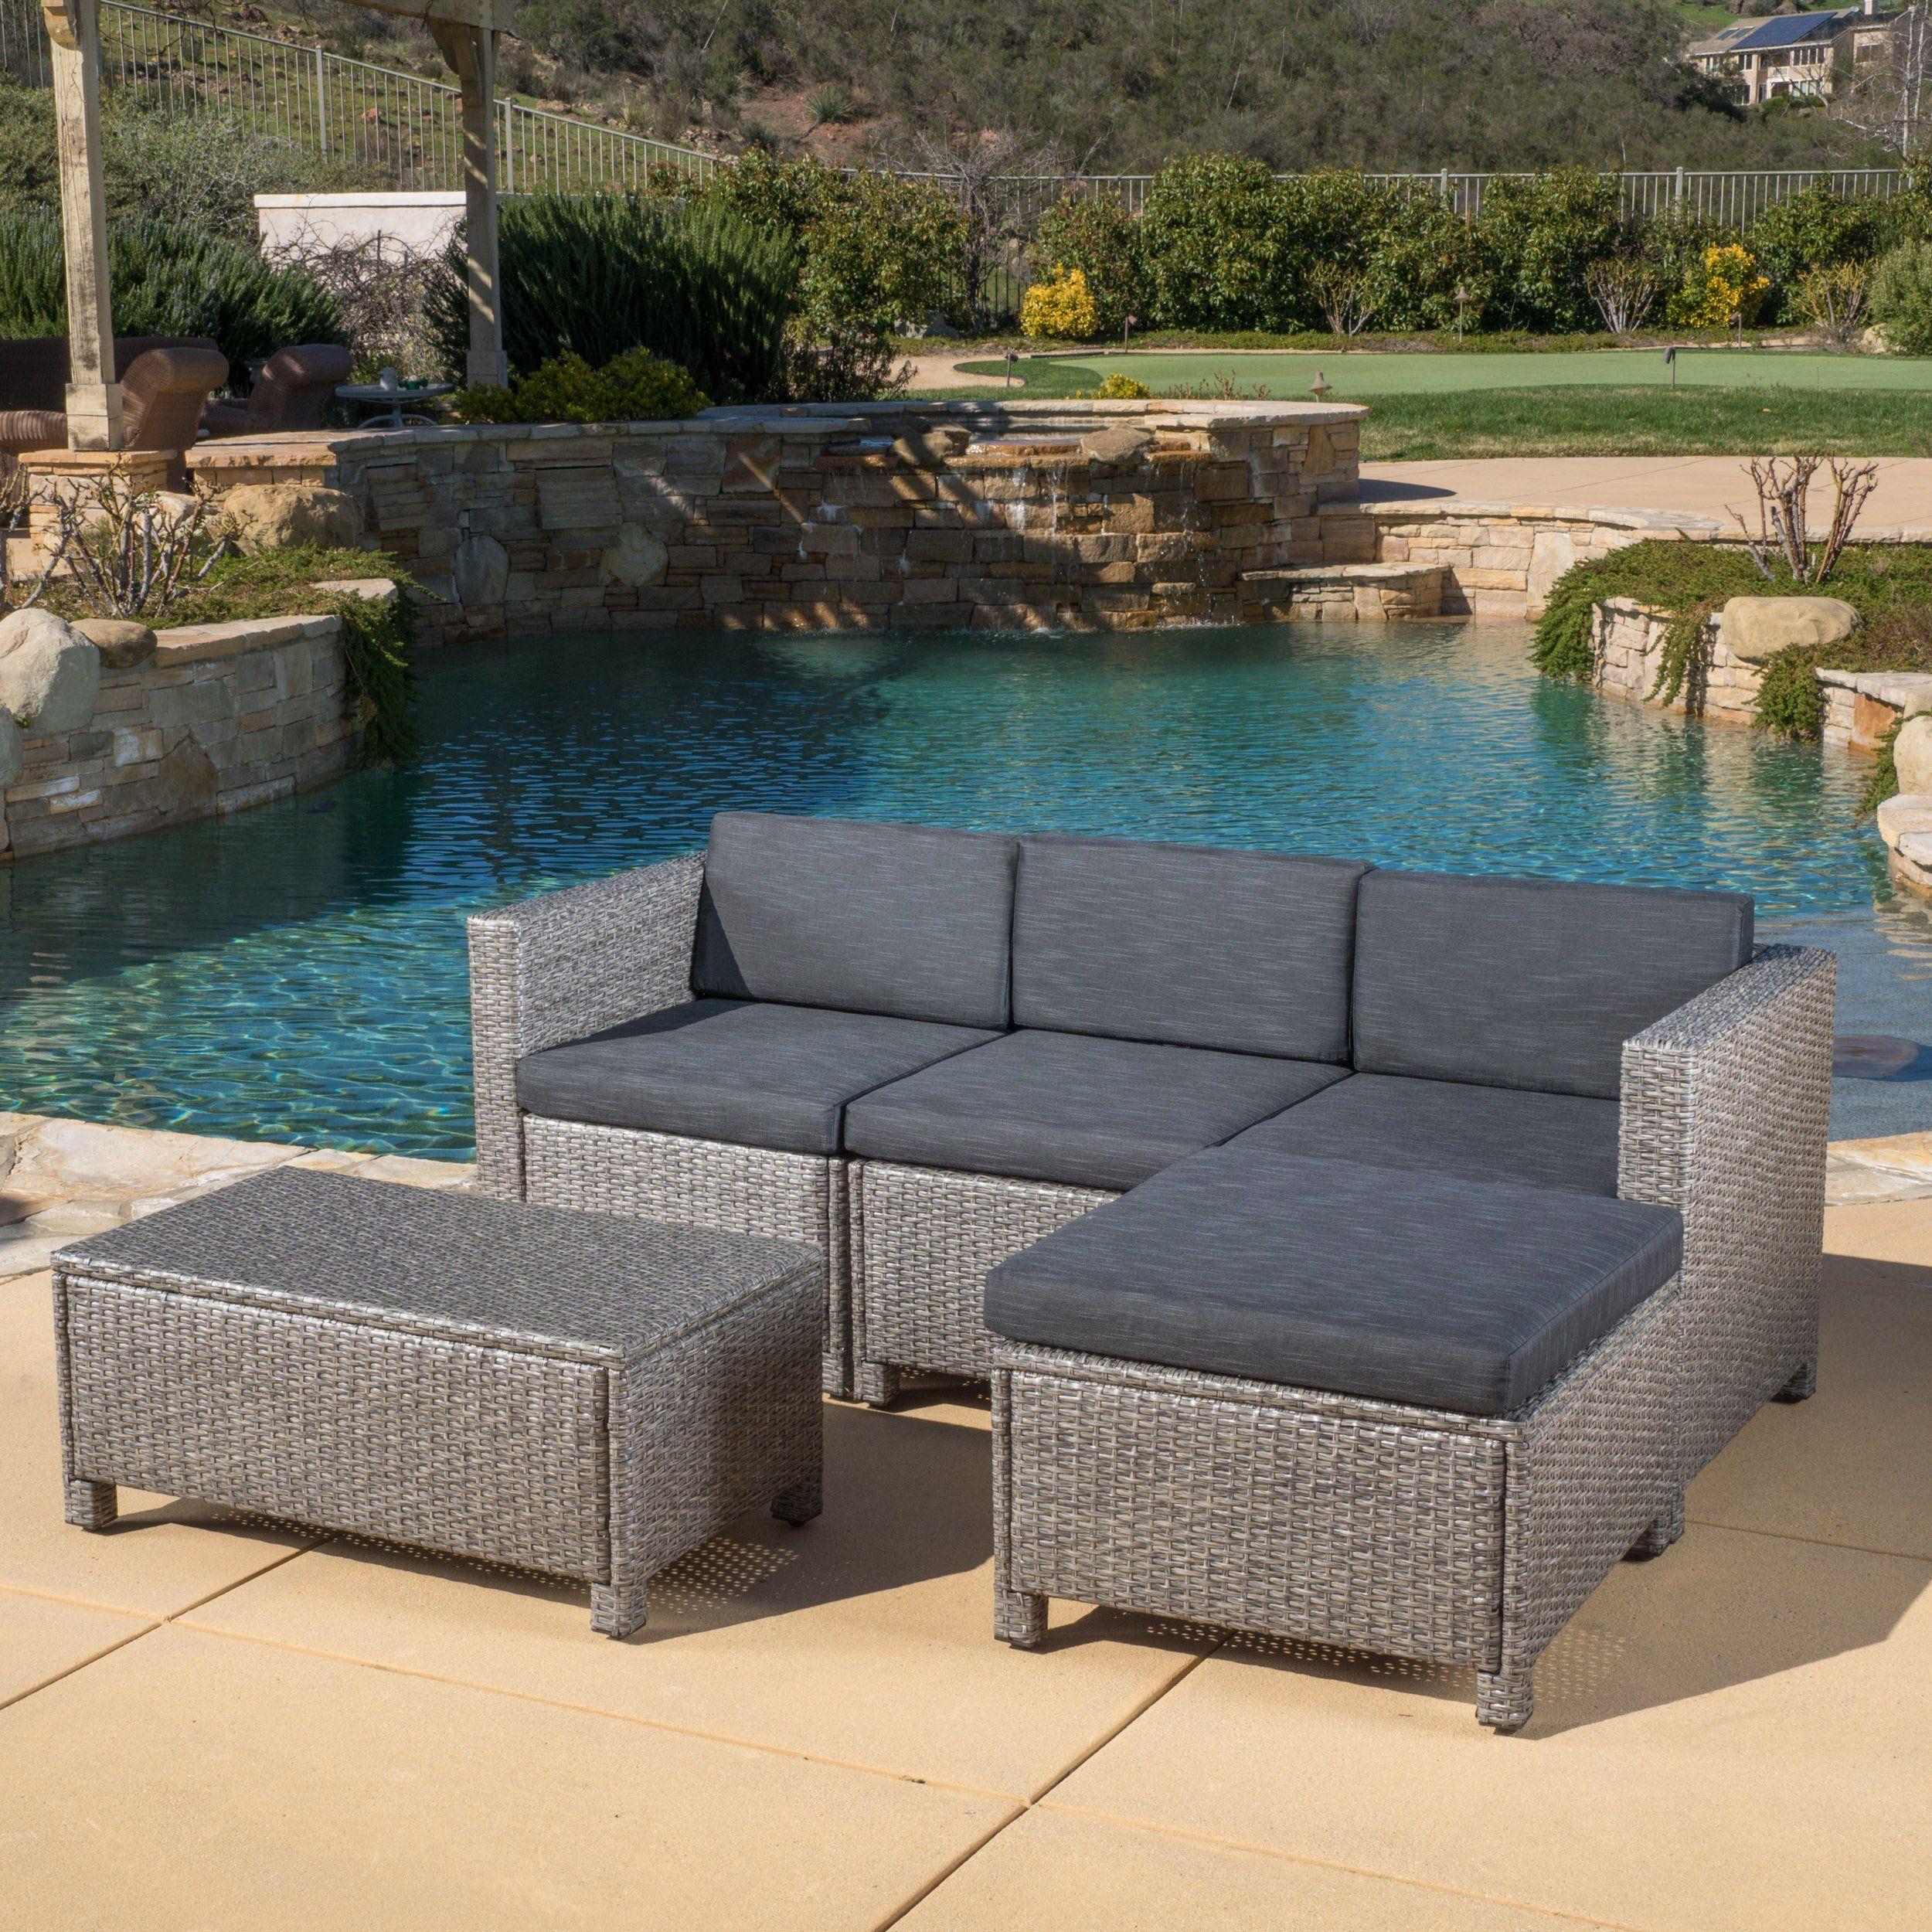 Lorita Outdoor 5 piece Grey Wicker Sectional Sofa Set with Black